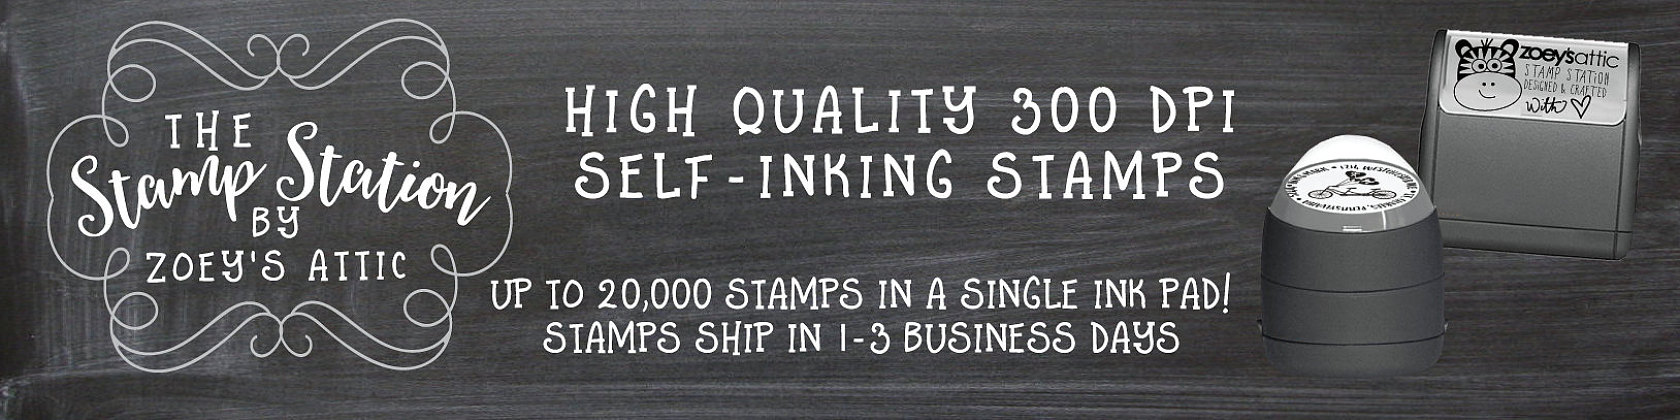 stamp-station.jpg